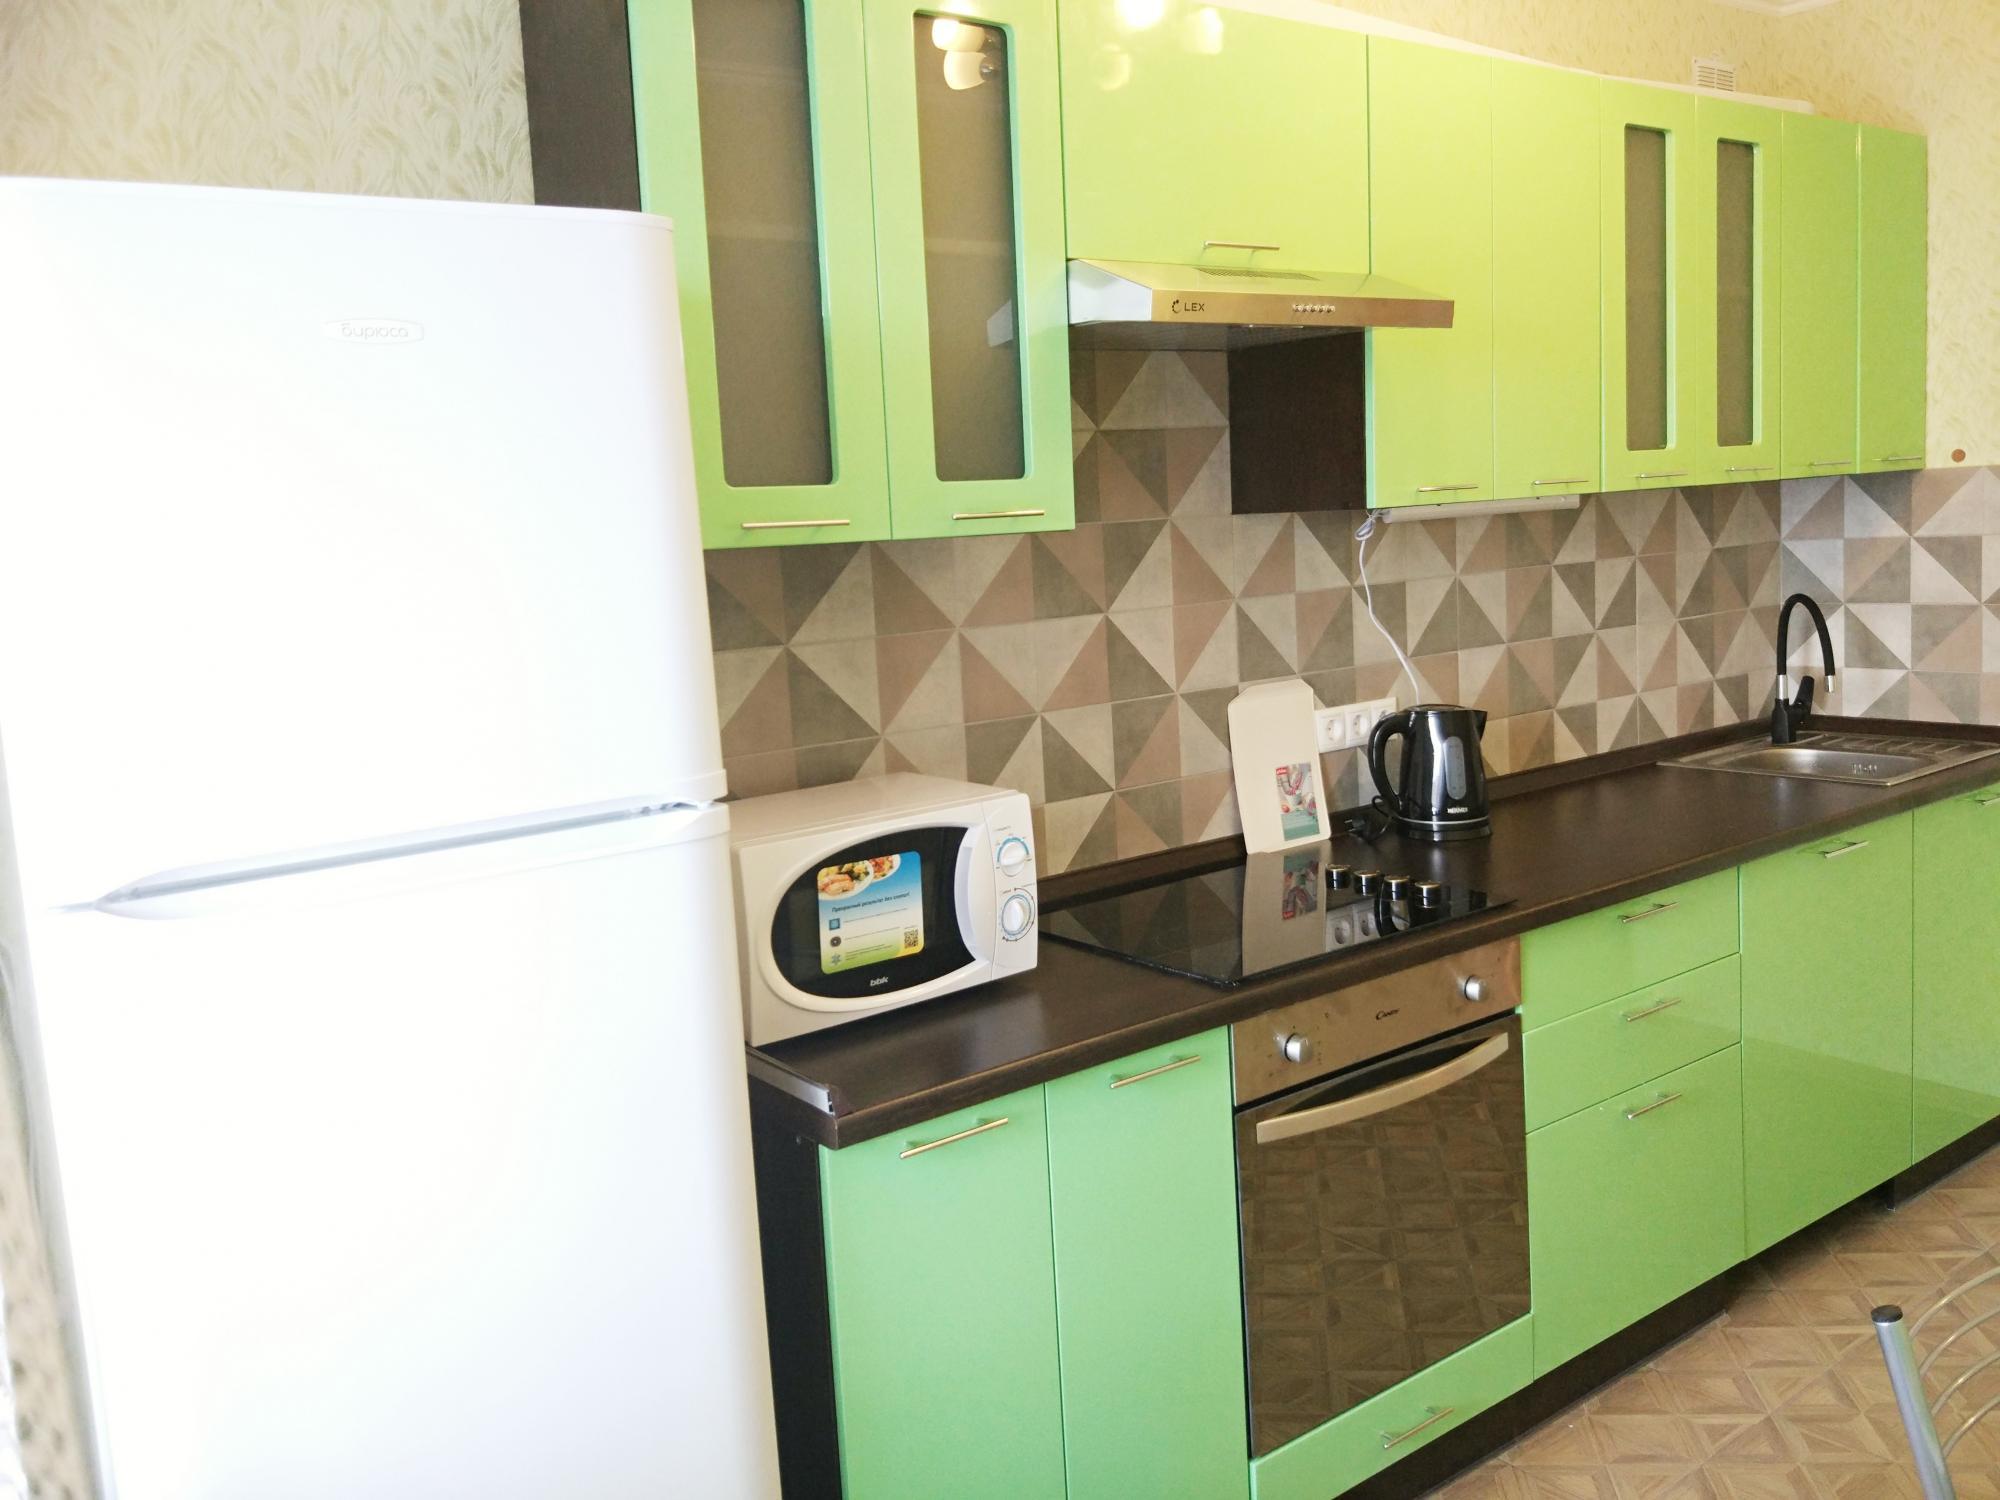 Квартира, 1 комната, 38 м² в Климовске 89258731076 купить 6